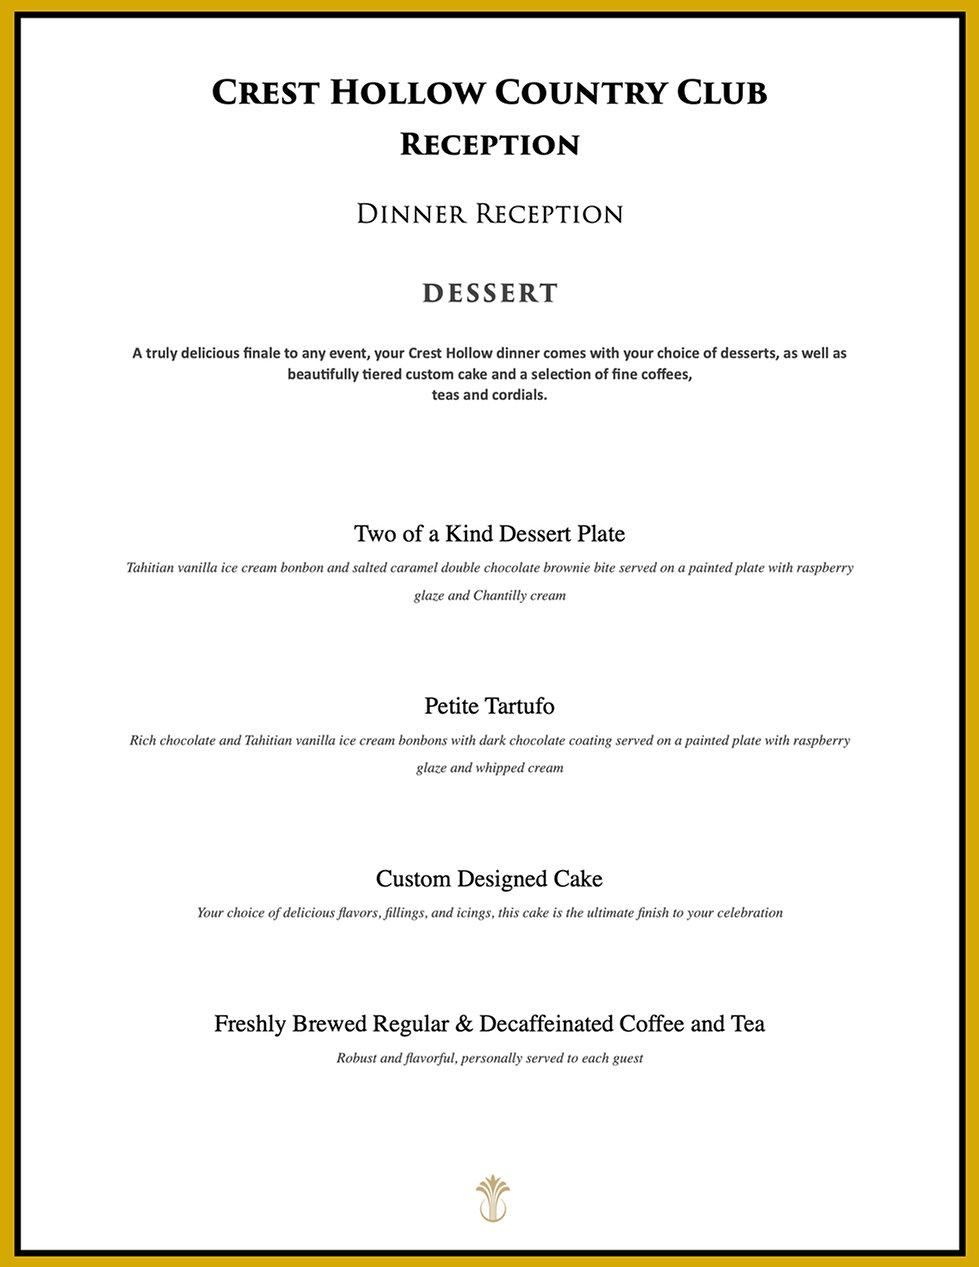 Reception Menu - Page 11.jpg